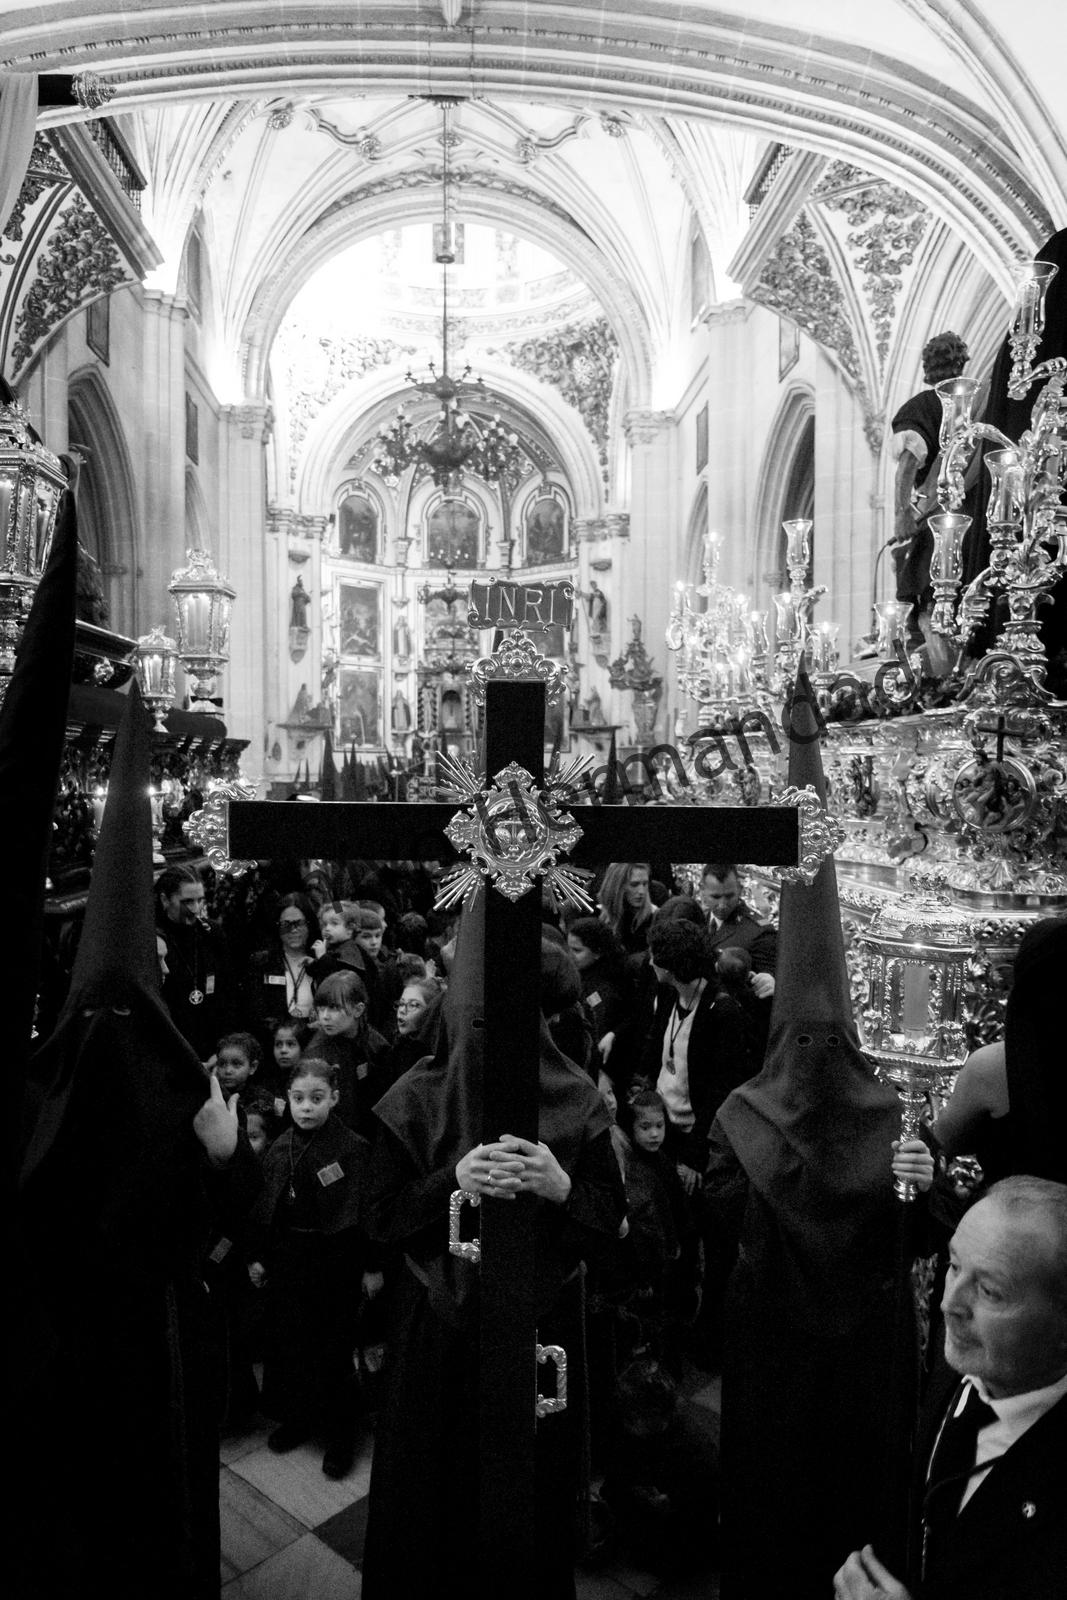 Crónica de la Semana Santa 2018